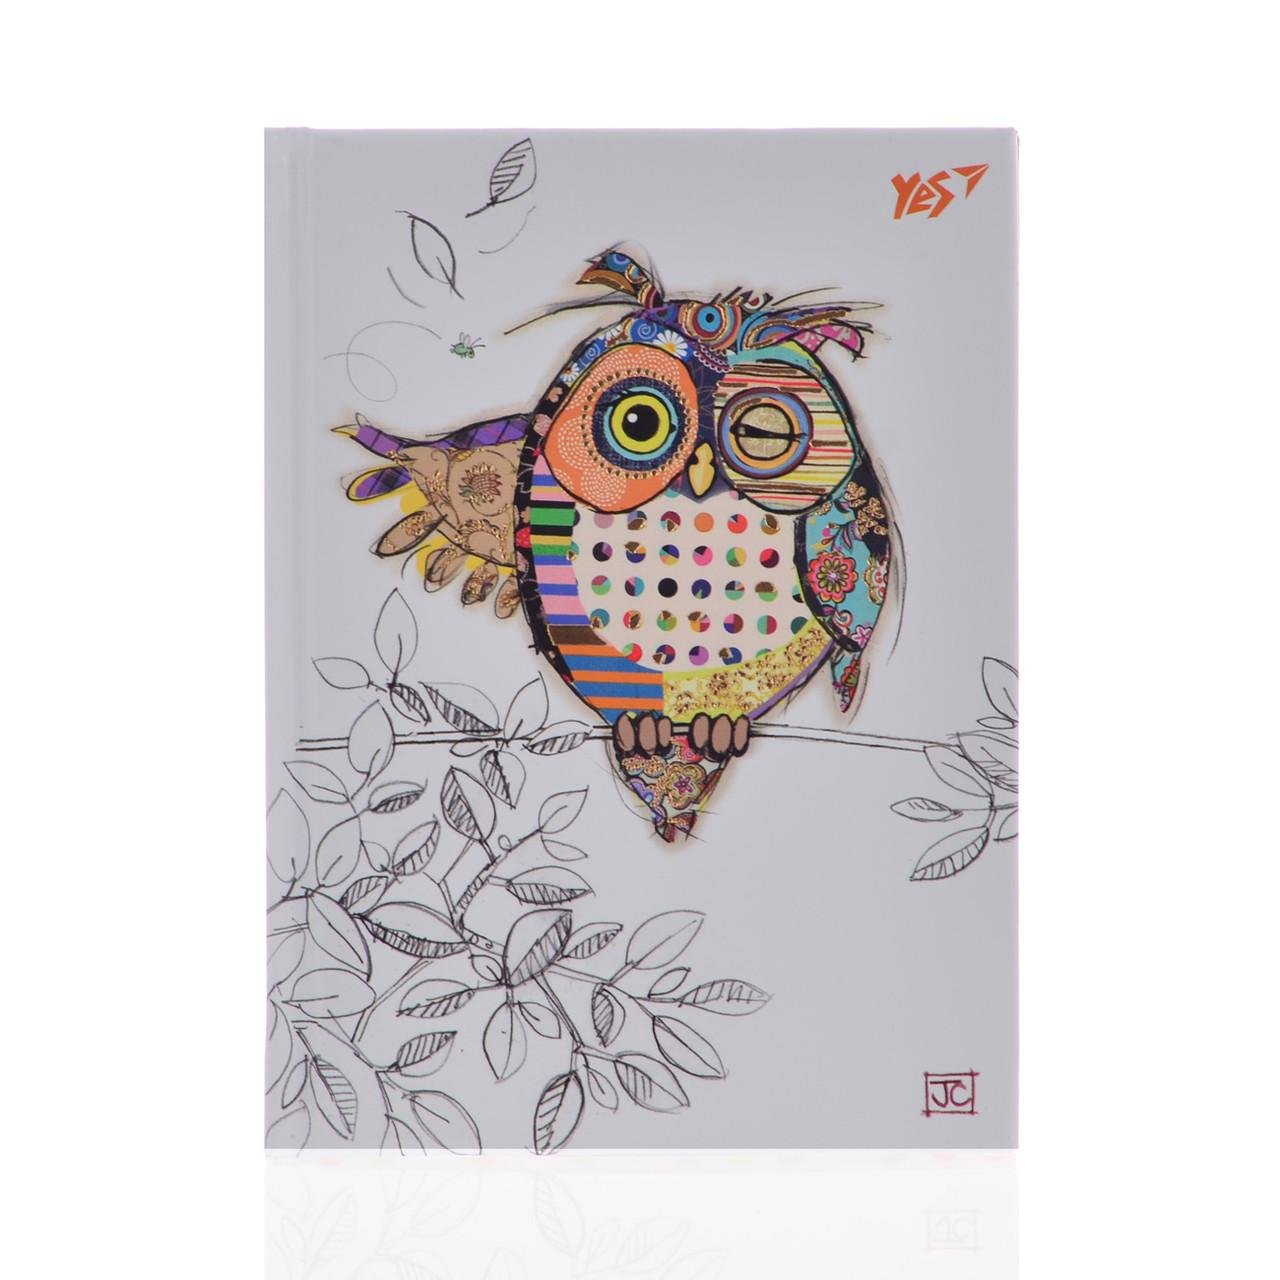 "Блокнот А6/64 КЛ. 7БЦ, фольга золото+Уф.выб. ""BugArt. White owl"" YES"